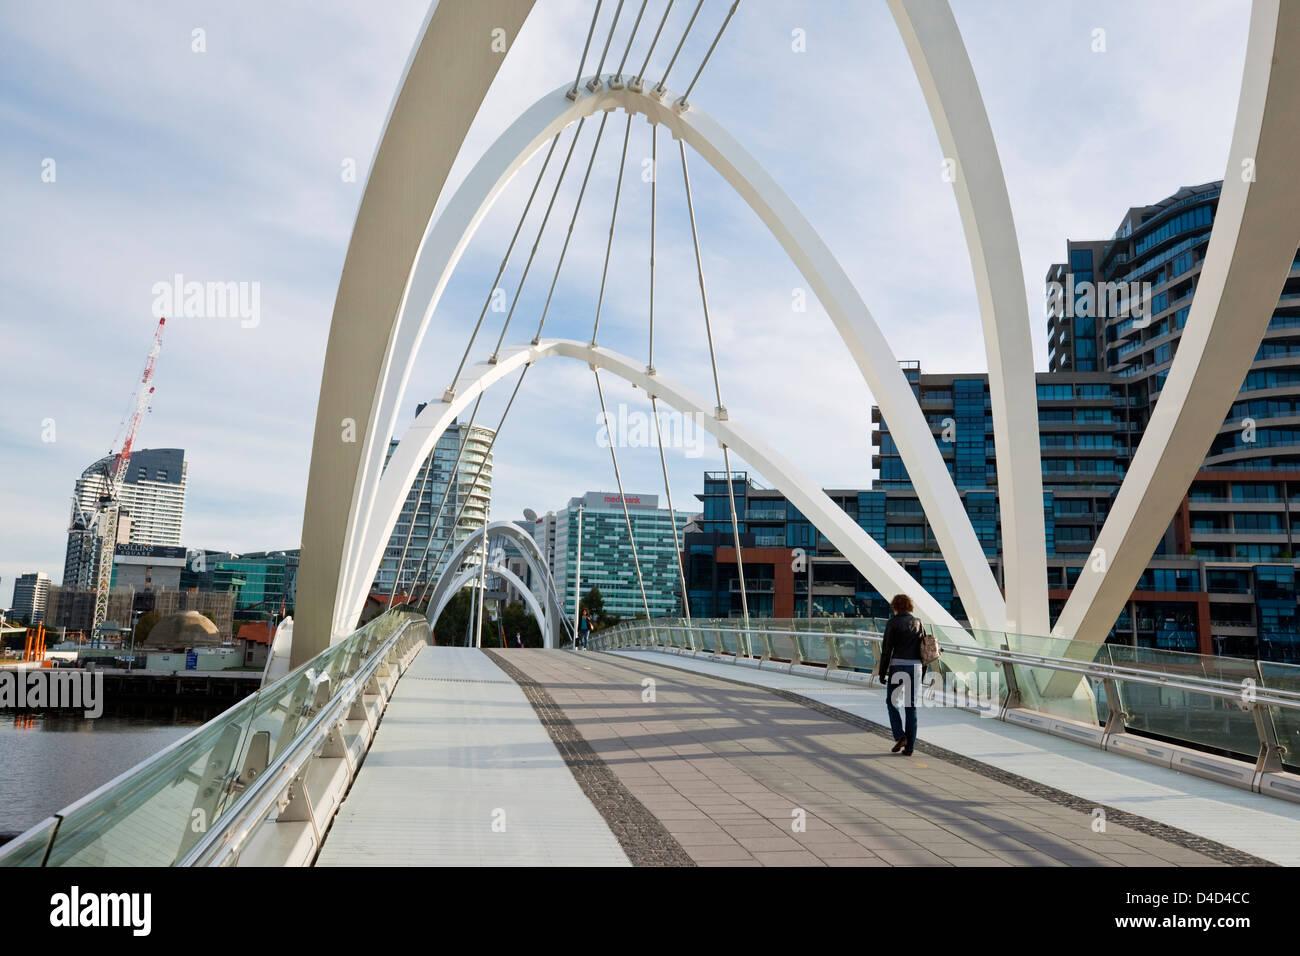 The Seafarers Bridge - a footbridge connecting Docklands with South Wharf. Melbourne, Victoria, Australia - Stock Image